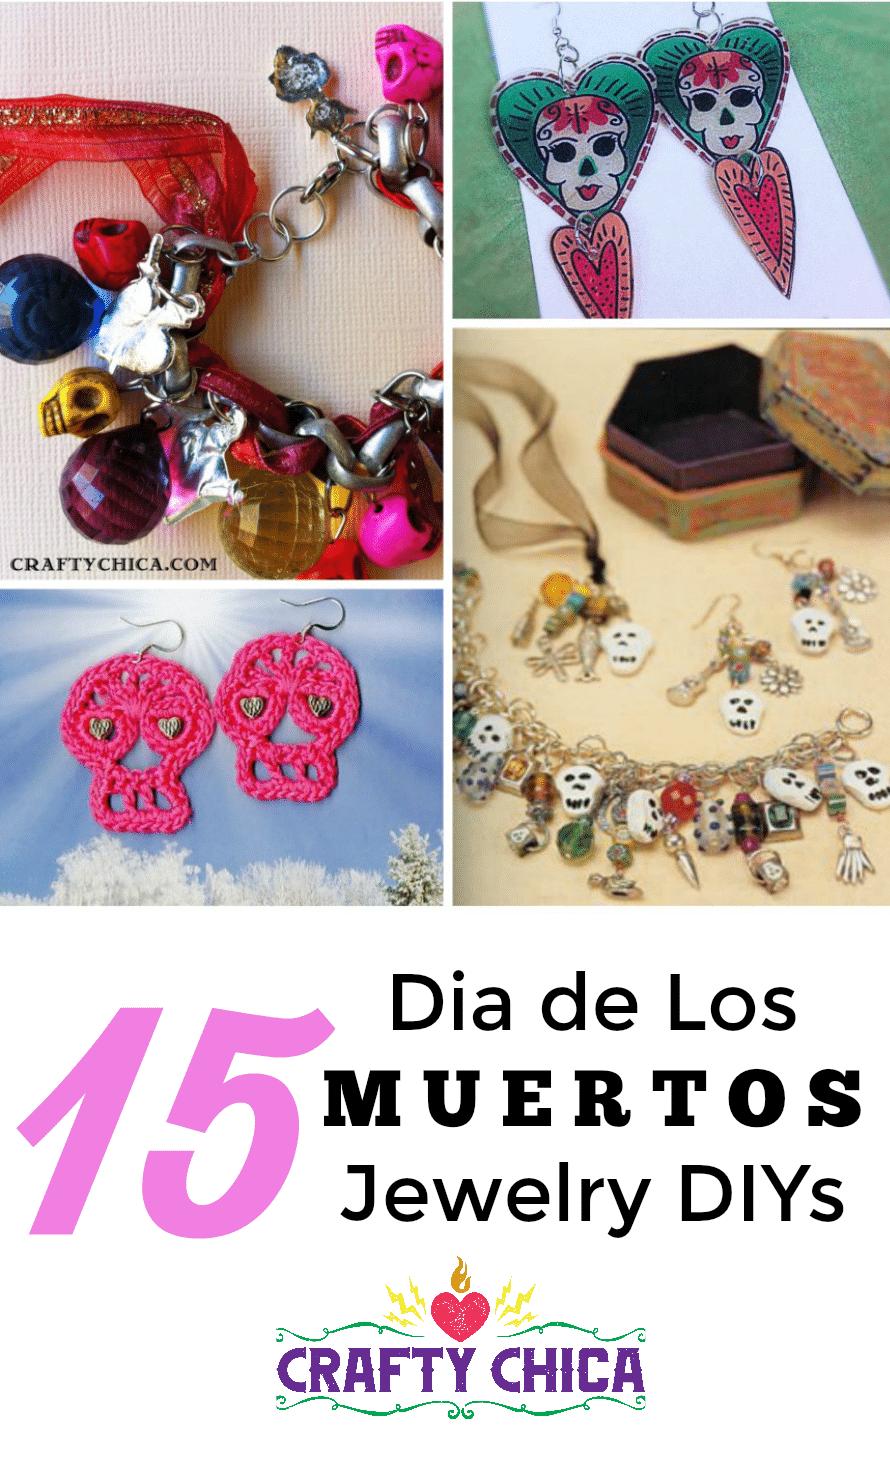 Muertos Jewelry ideas